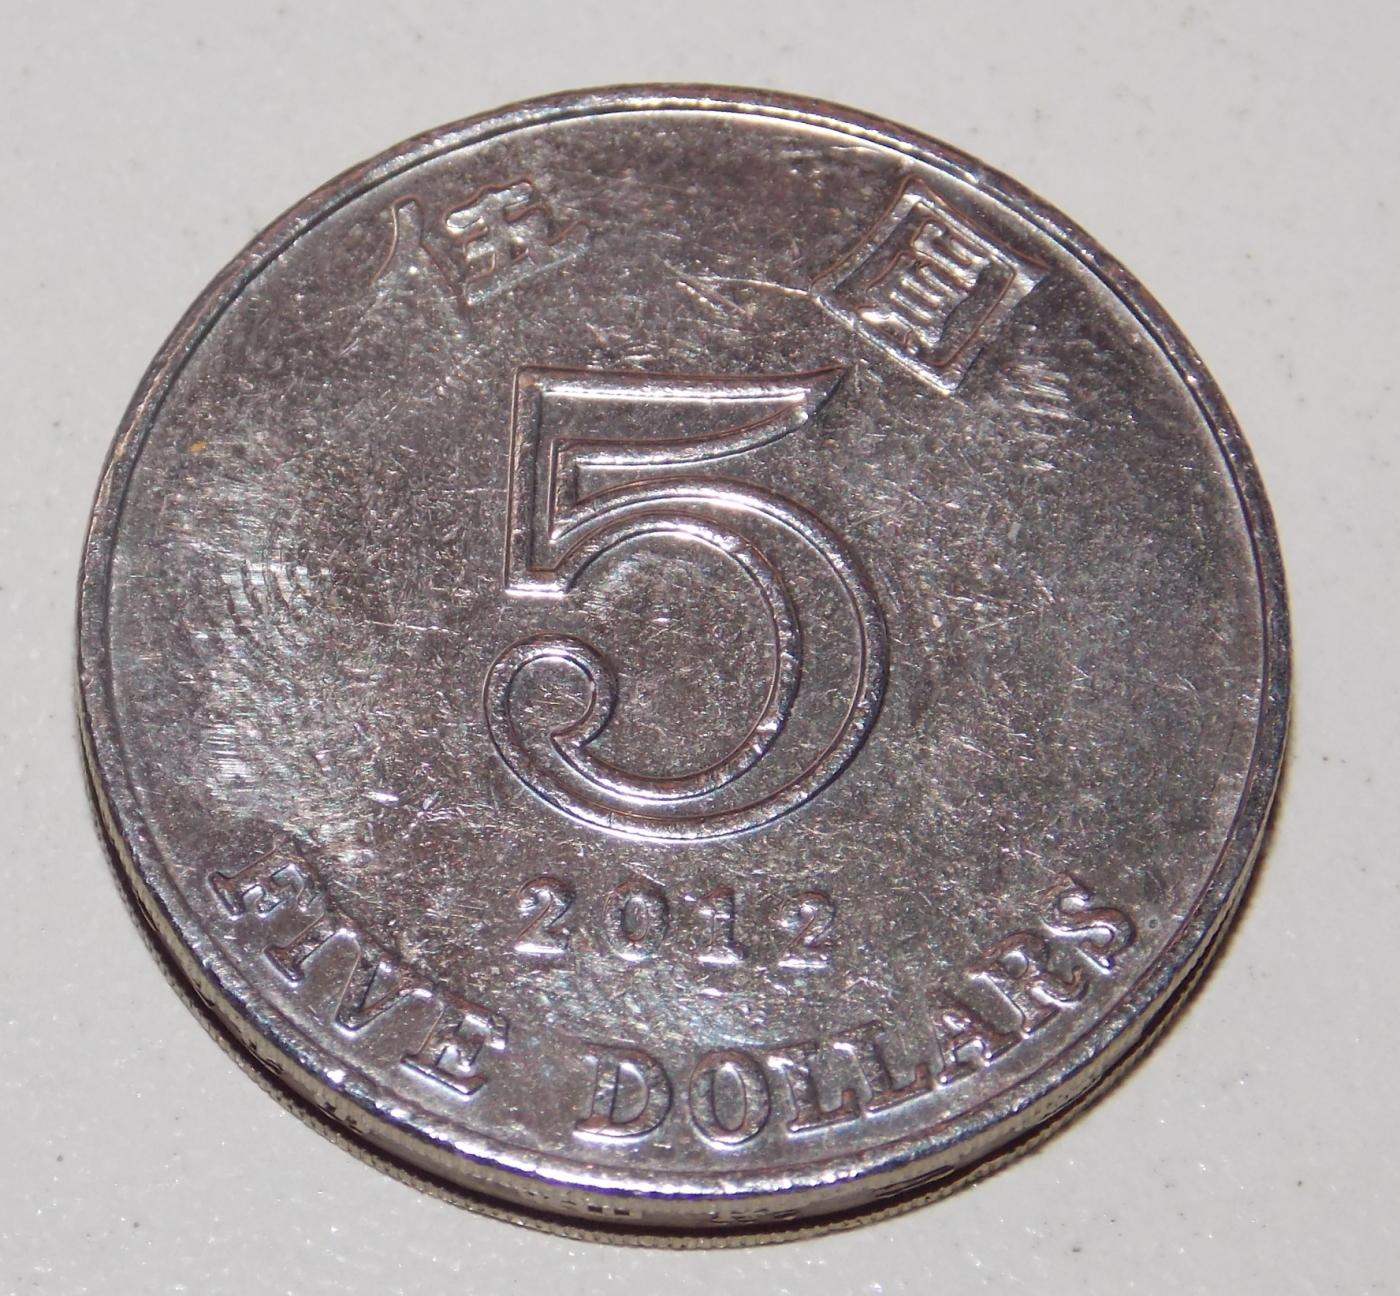 5 Dollars 2012 Special Administrative Region 2011 2020